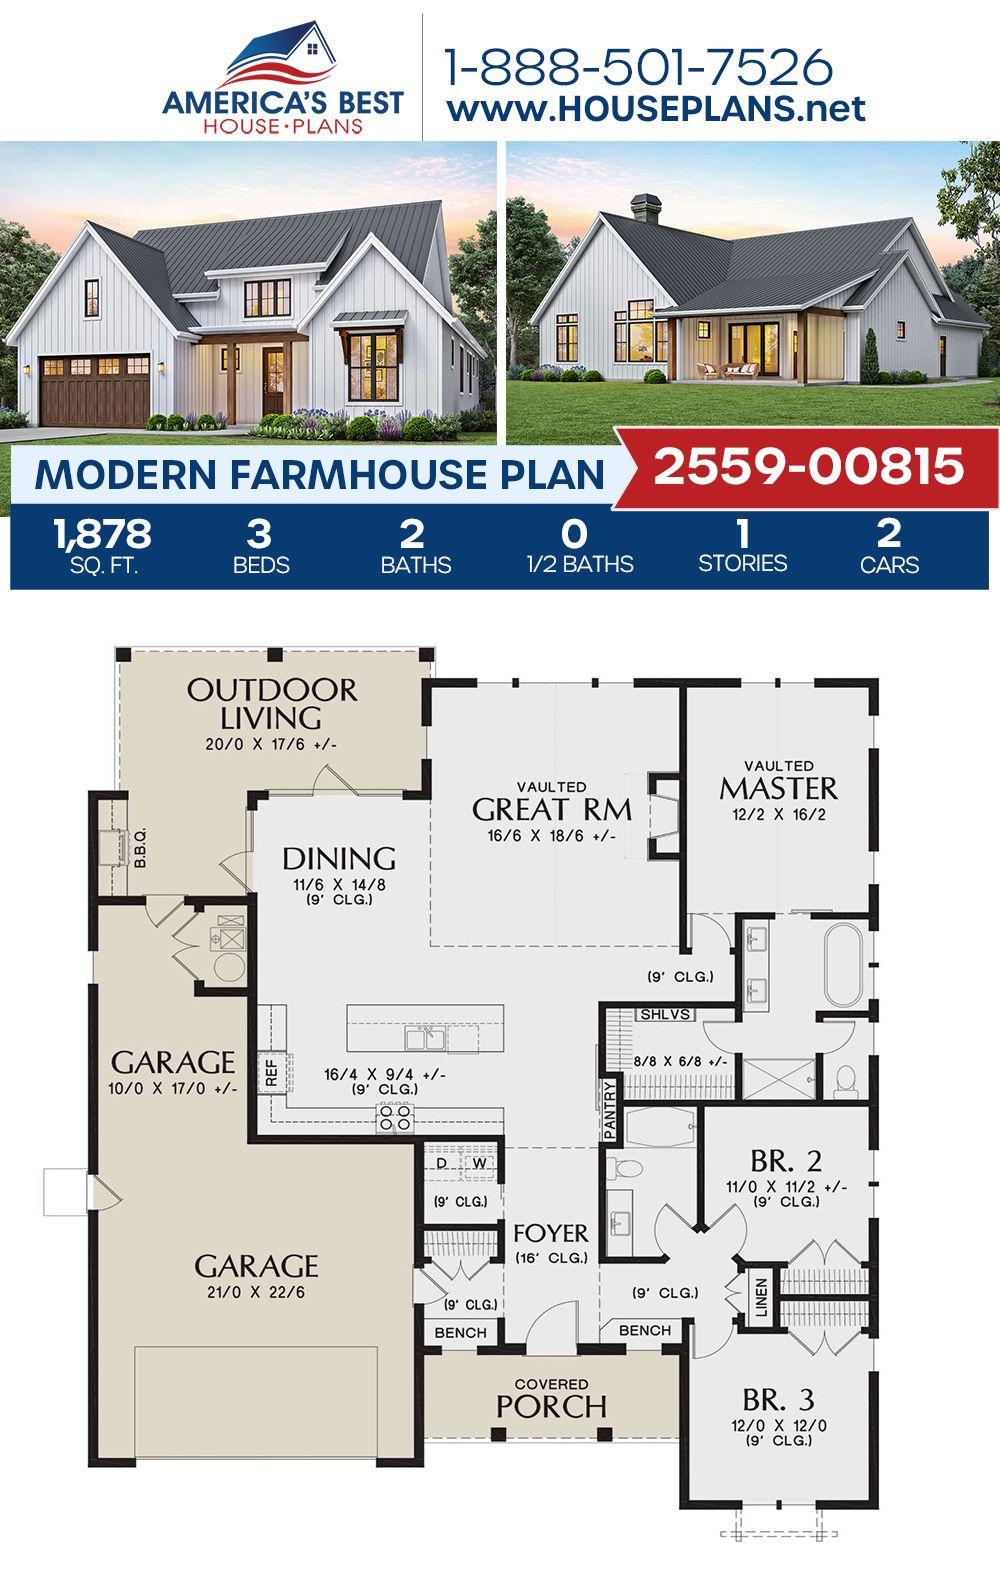 House Plan 2559 00815 Modern Farmhouse Plan 1 878 Square Feet 3 Bedrooms 2 Bathrooms In 2020 Modern Farmhouse Plans Farmhouse Plans Farmhouse Floor Plans